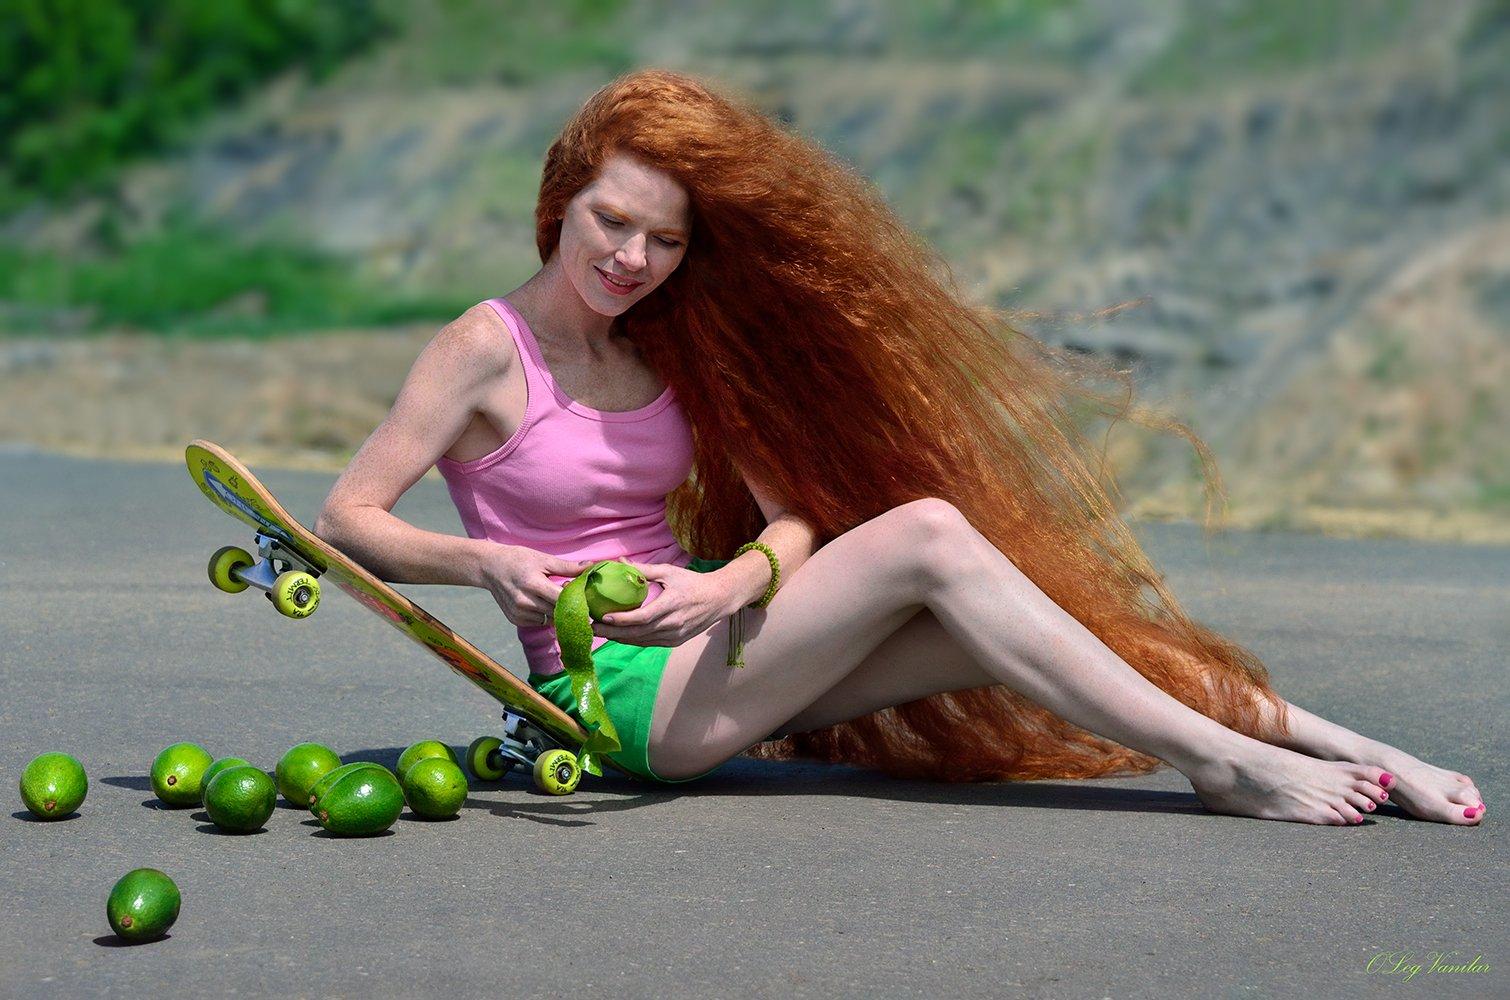 лето, девушка, красота, дорога, Олег Ванилар